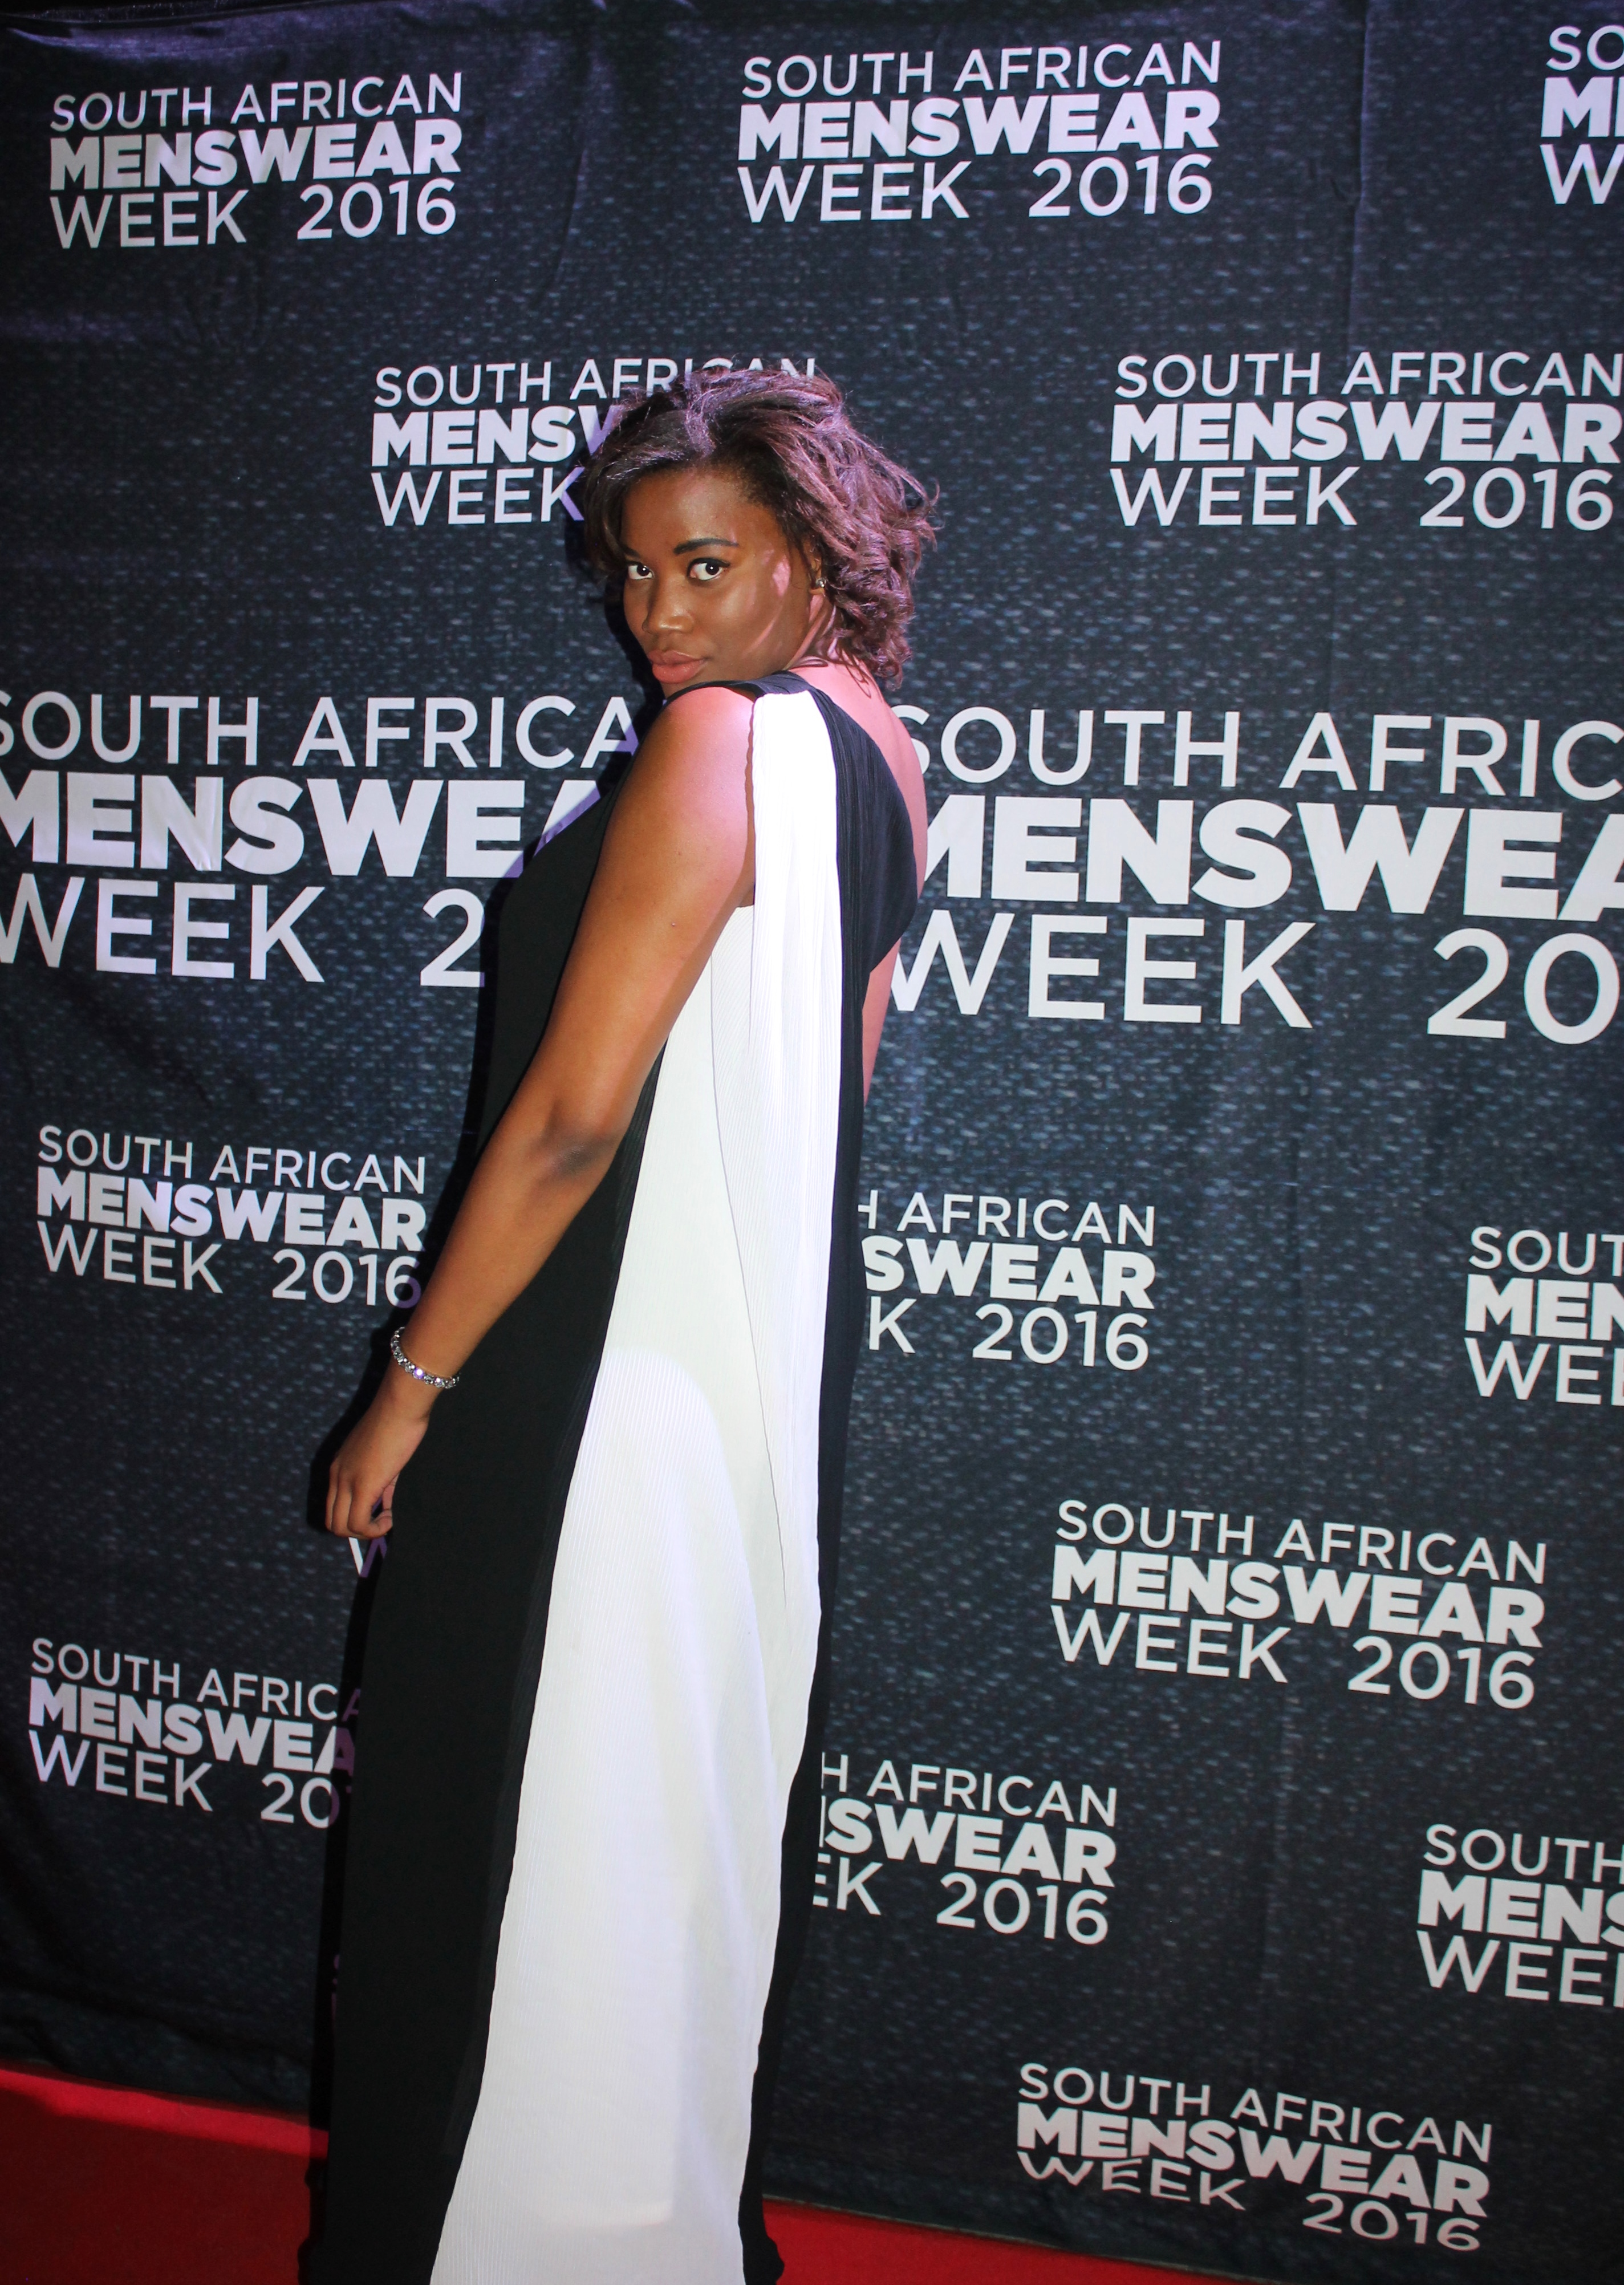 SA Menswear week 2016